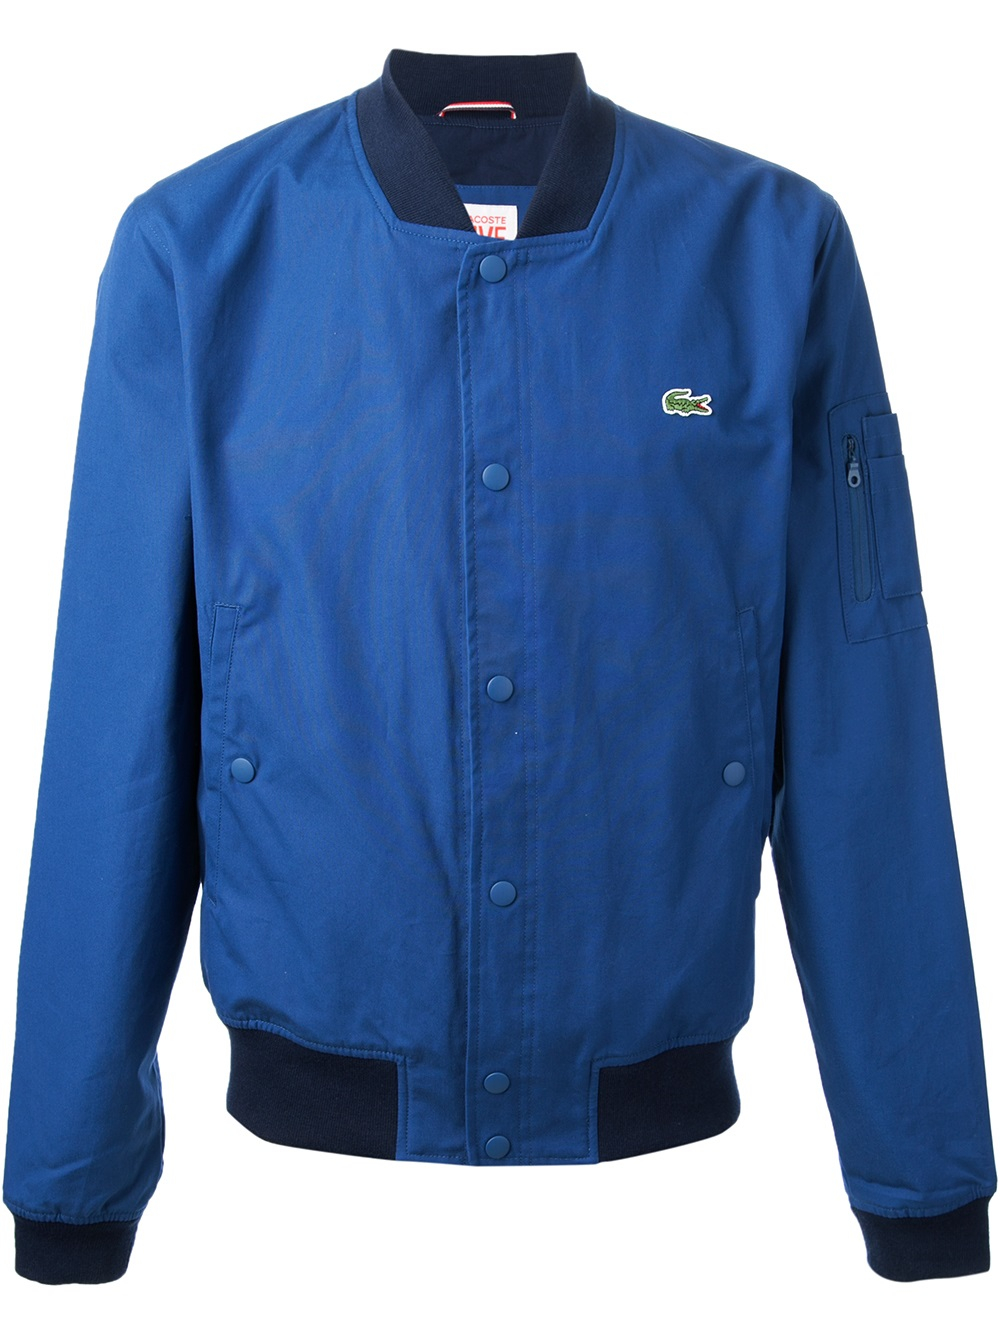 lacoste l ive classic bomber jacket in blue for men lyst. Black Bedroom Furniture Sets. Home Design Ideas